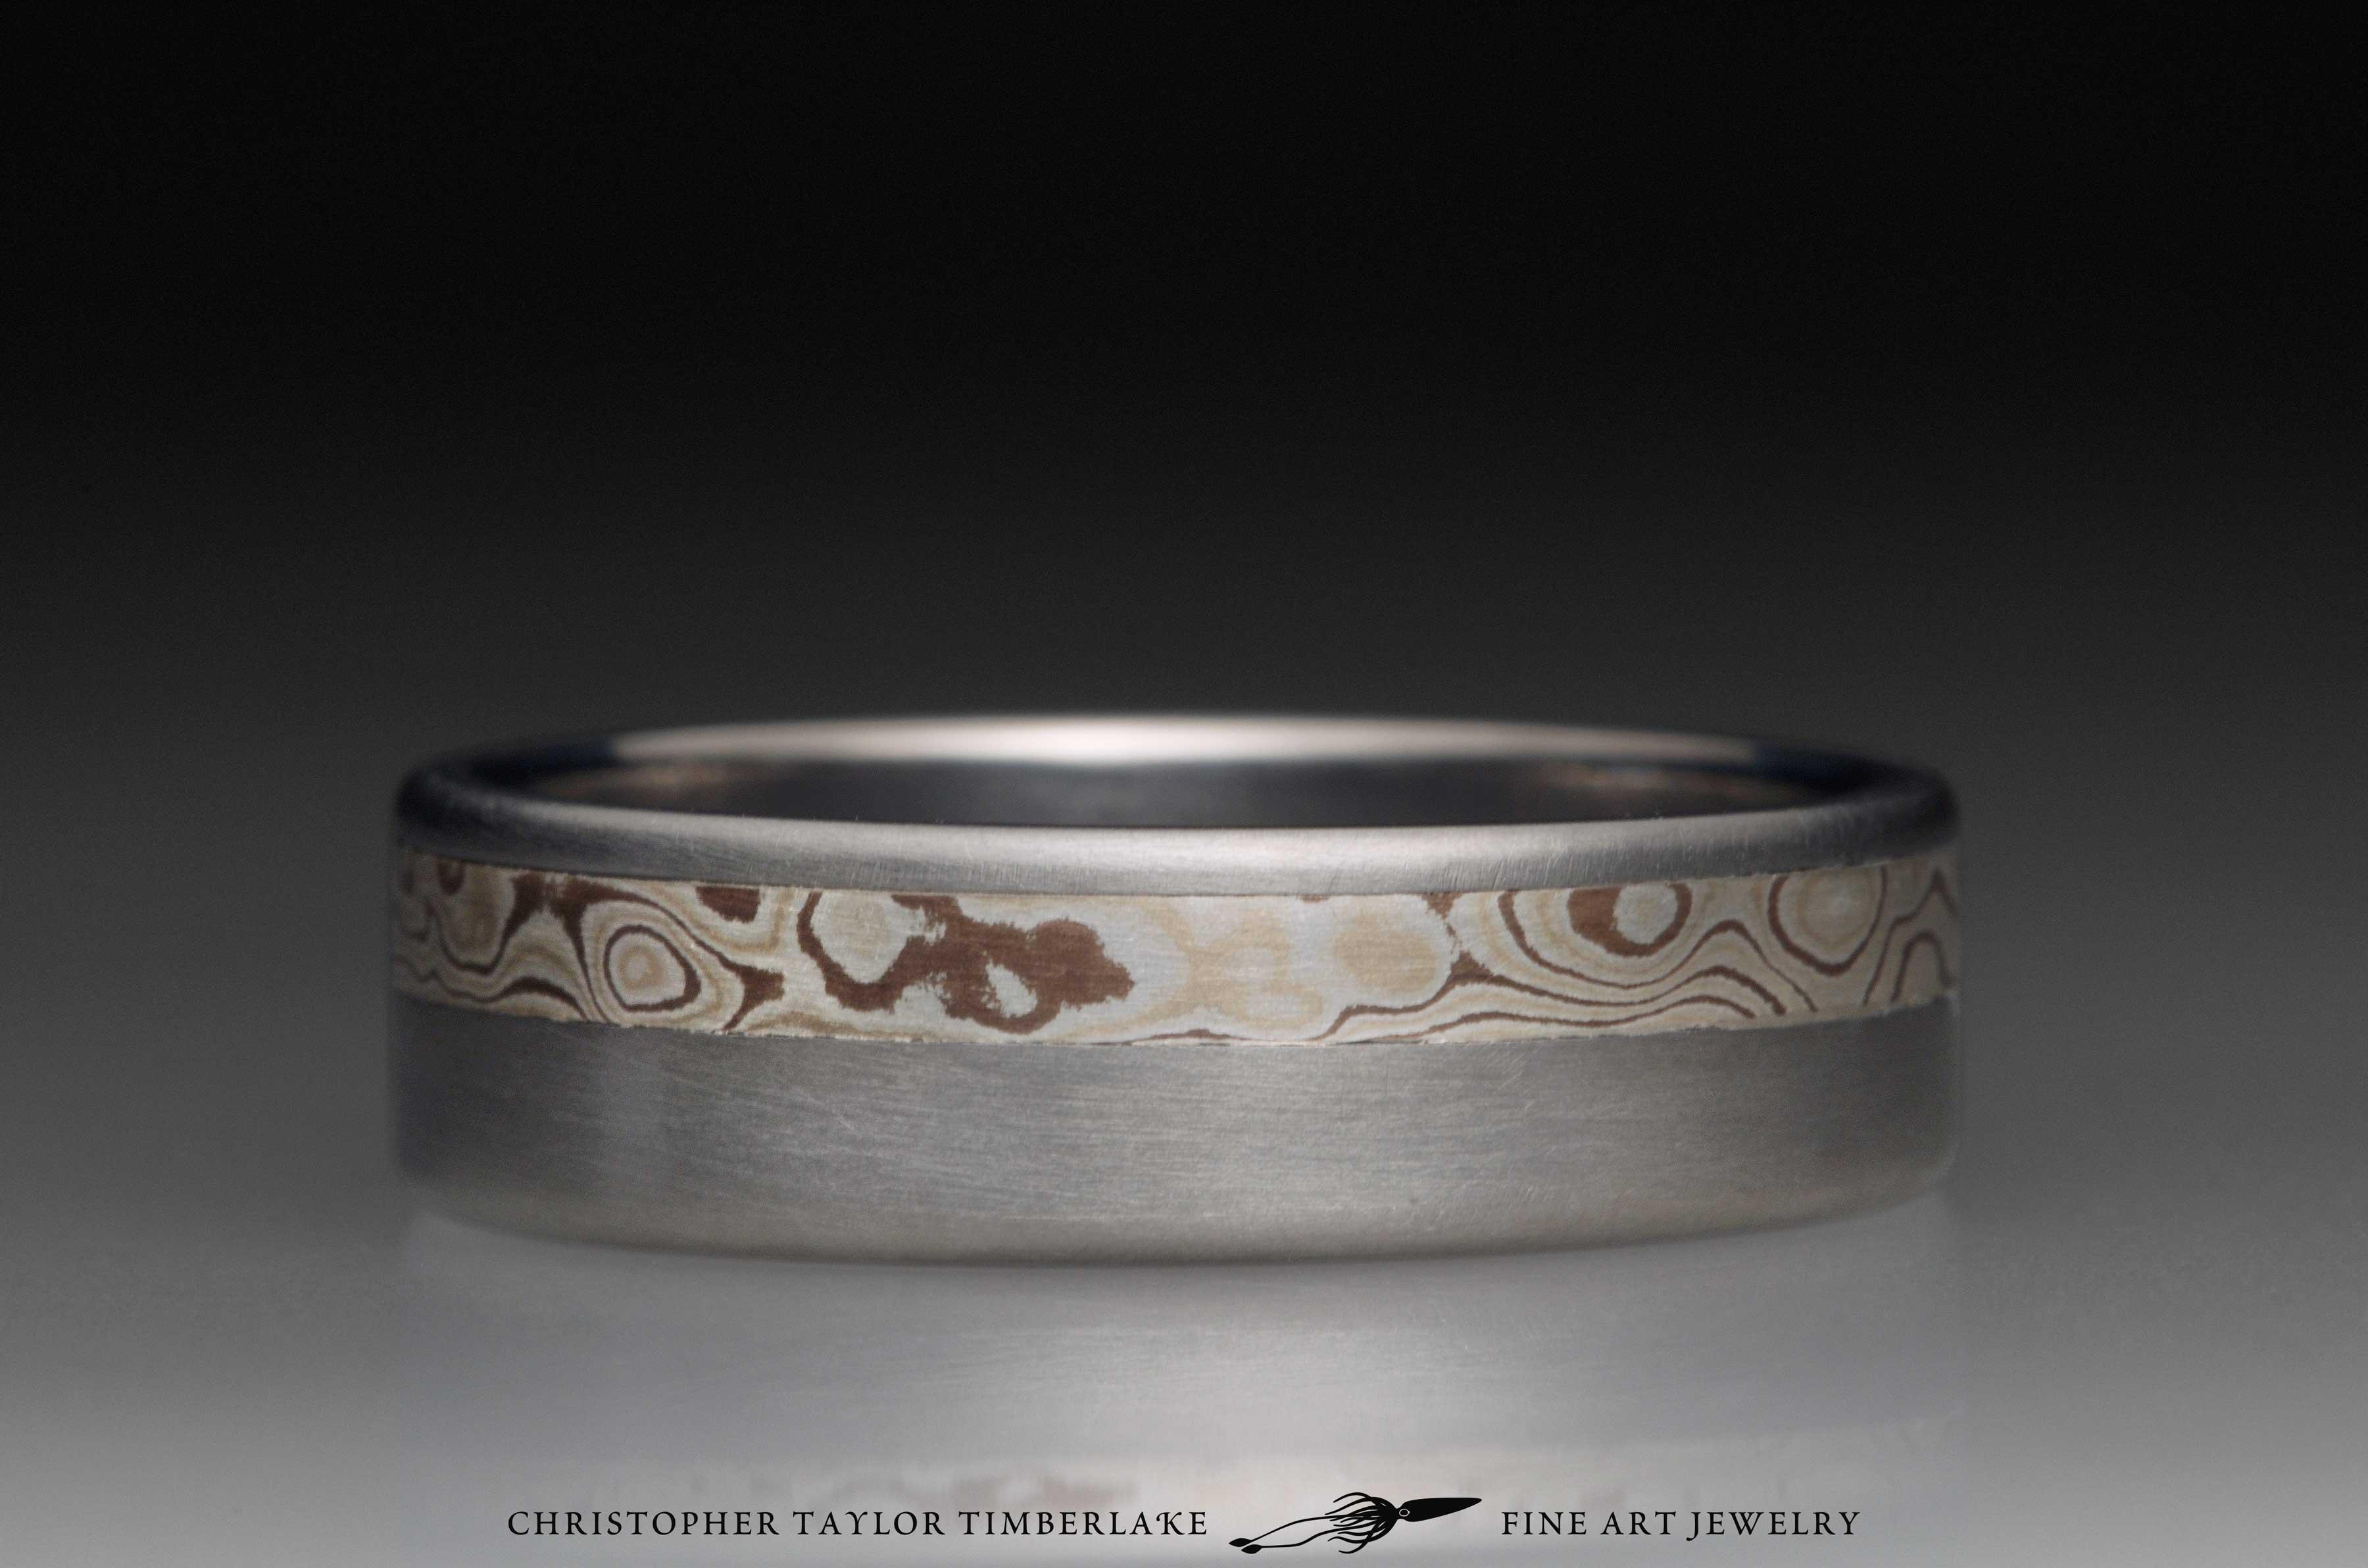 Mokume gane sterling silver, shakudo, and kogane inlay channel in titanium, 6.5mm (3.25-2.25-1) 4